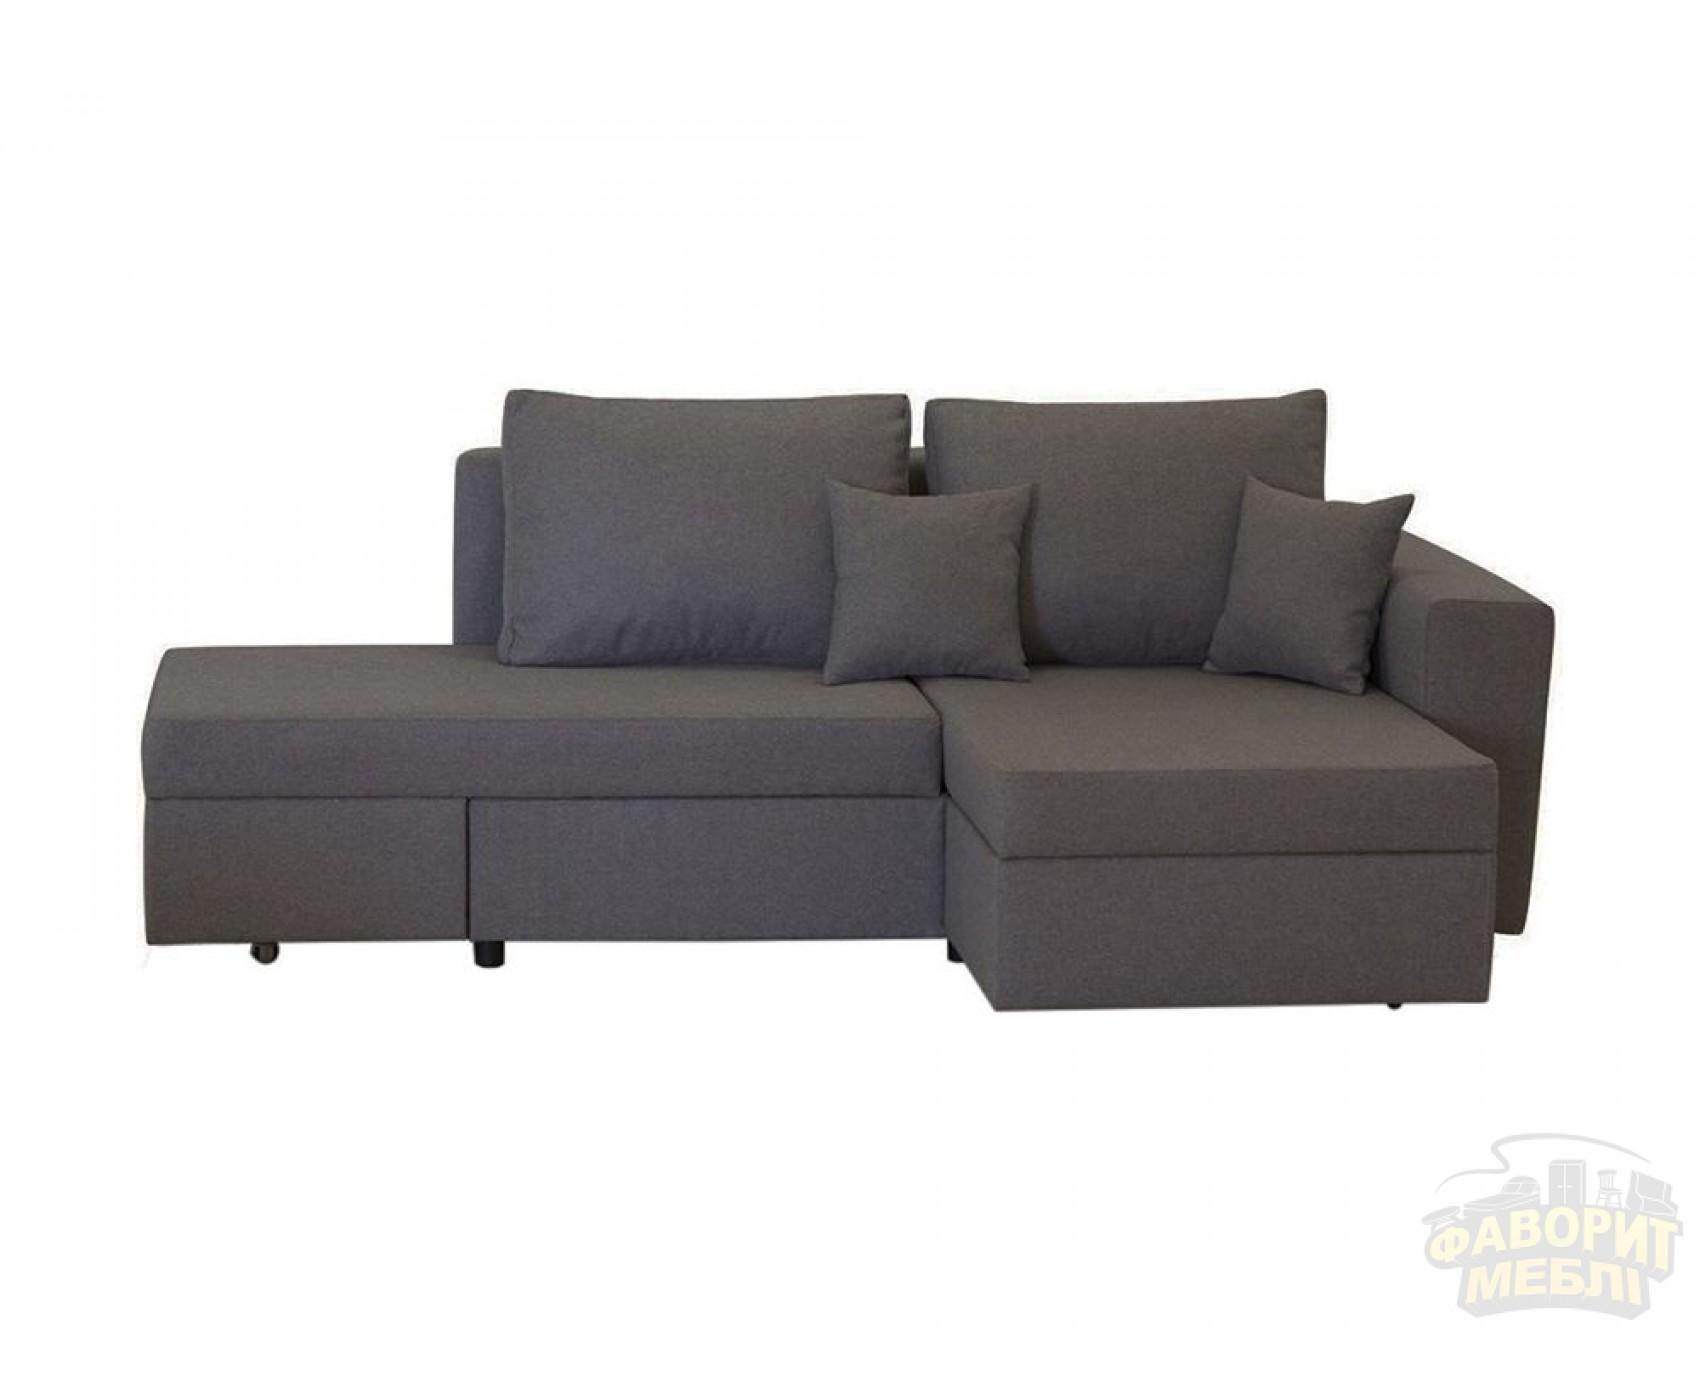 Угловой диван Домино со склада